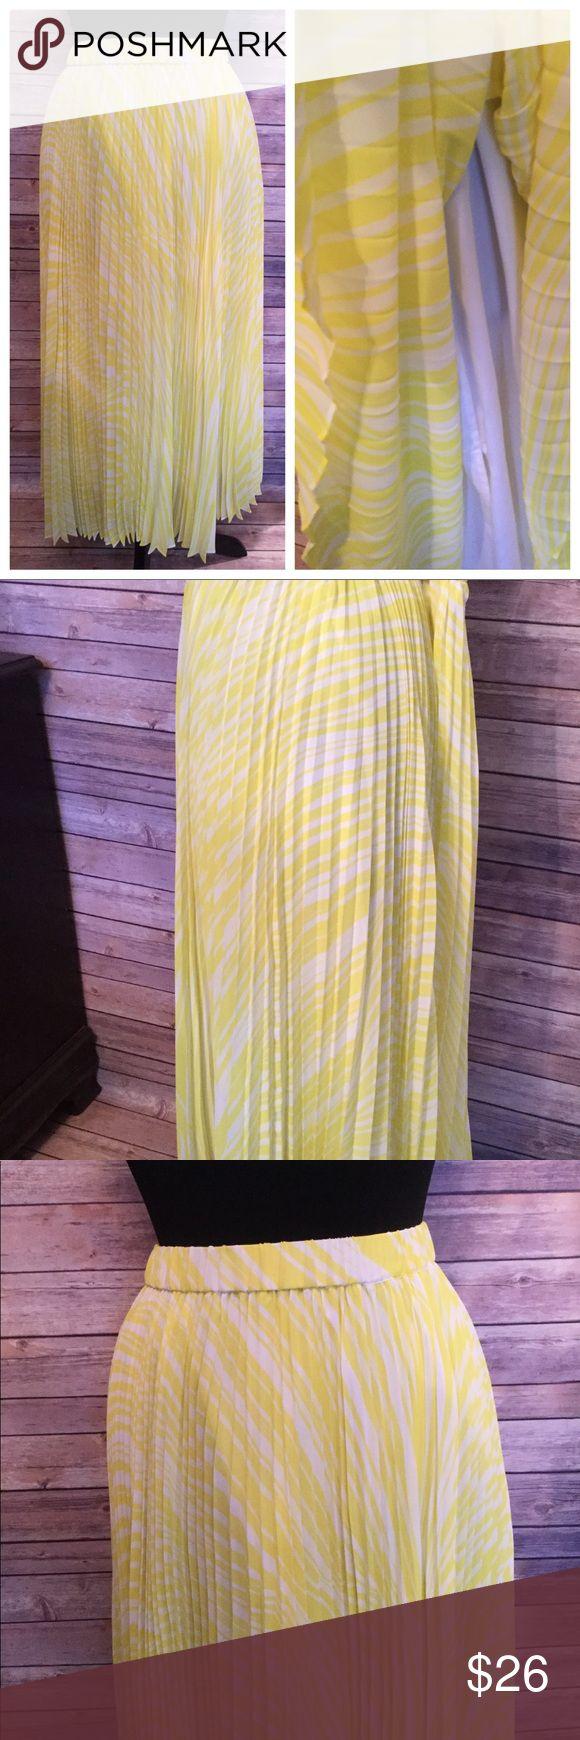 Soft Surroundings Yellow Long Pleated Maxi Skirt Soft Surroundings Yellow Pattern Long Pleated Maxi Skirt  Size PM Petite Medium Elastic Waist Lined  Polyester Soft Surroundings Skirts Maxi